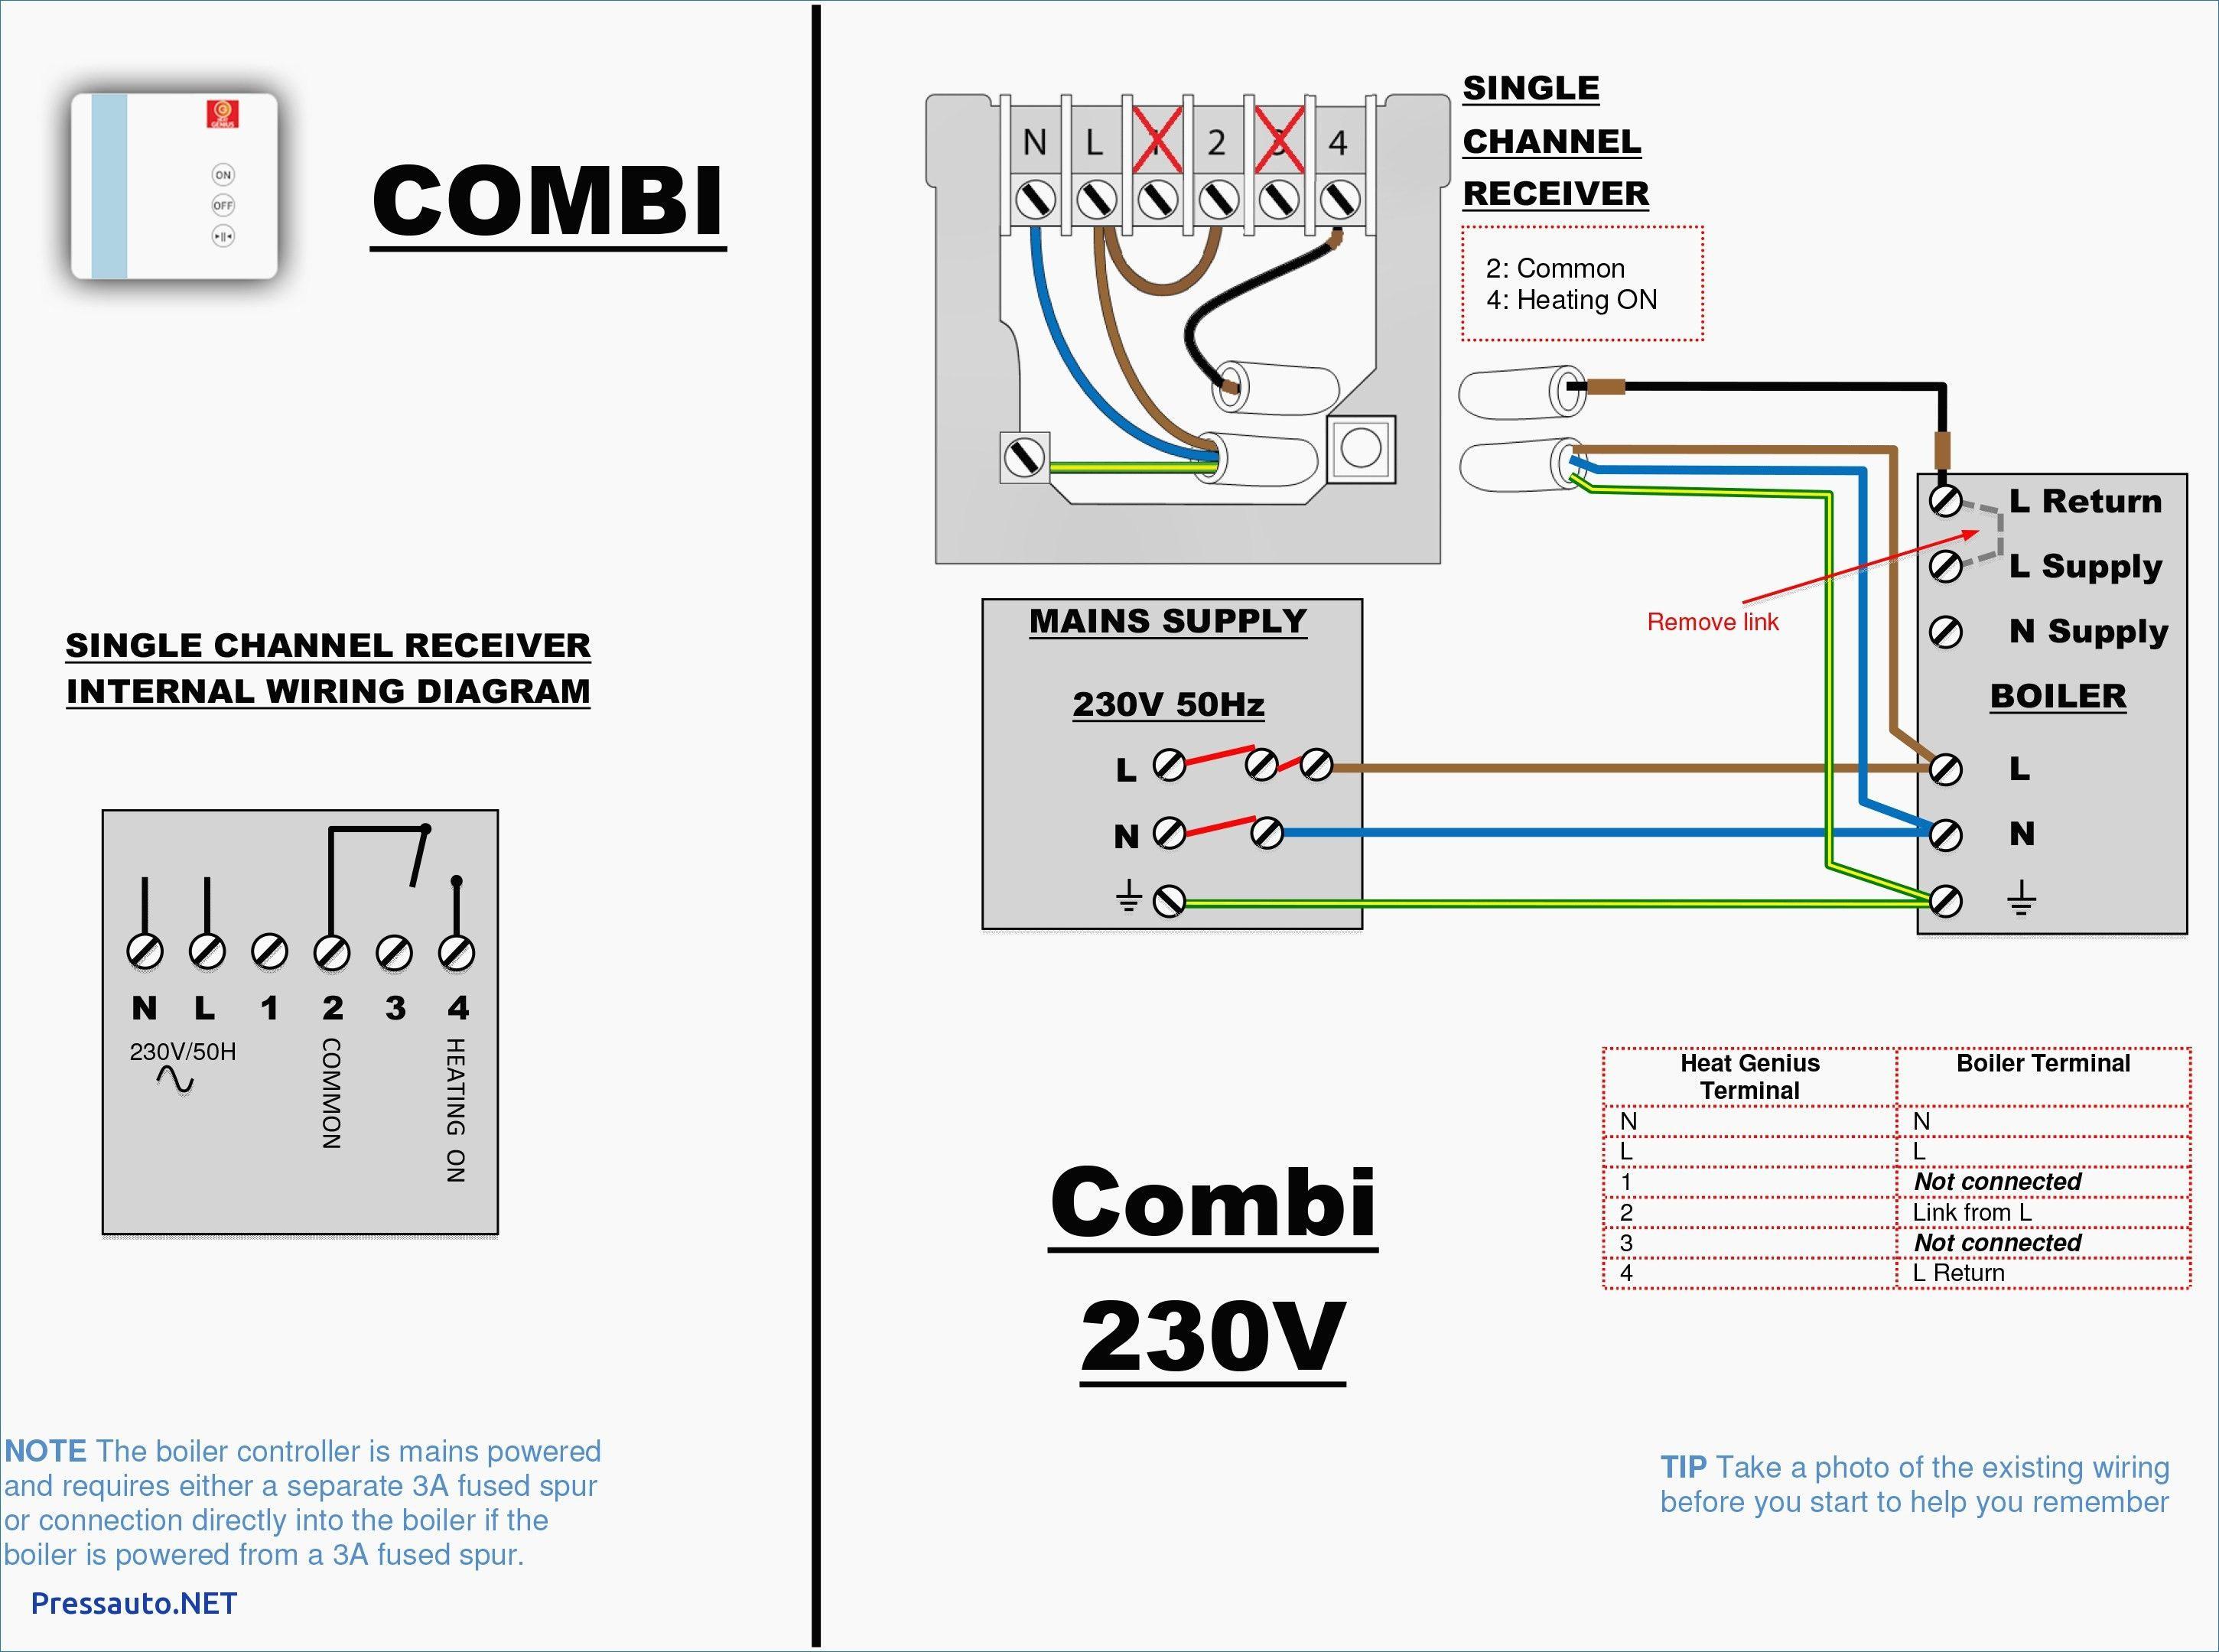 wiring diagram for underfloor heating to combi boiler wiring unique wiring diagram underfloor heating diagrams digramssample [ 2901 x 2160 Pixel ]